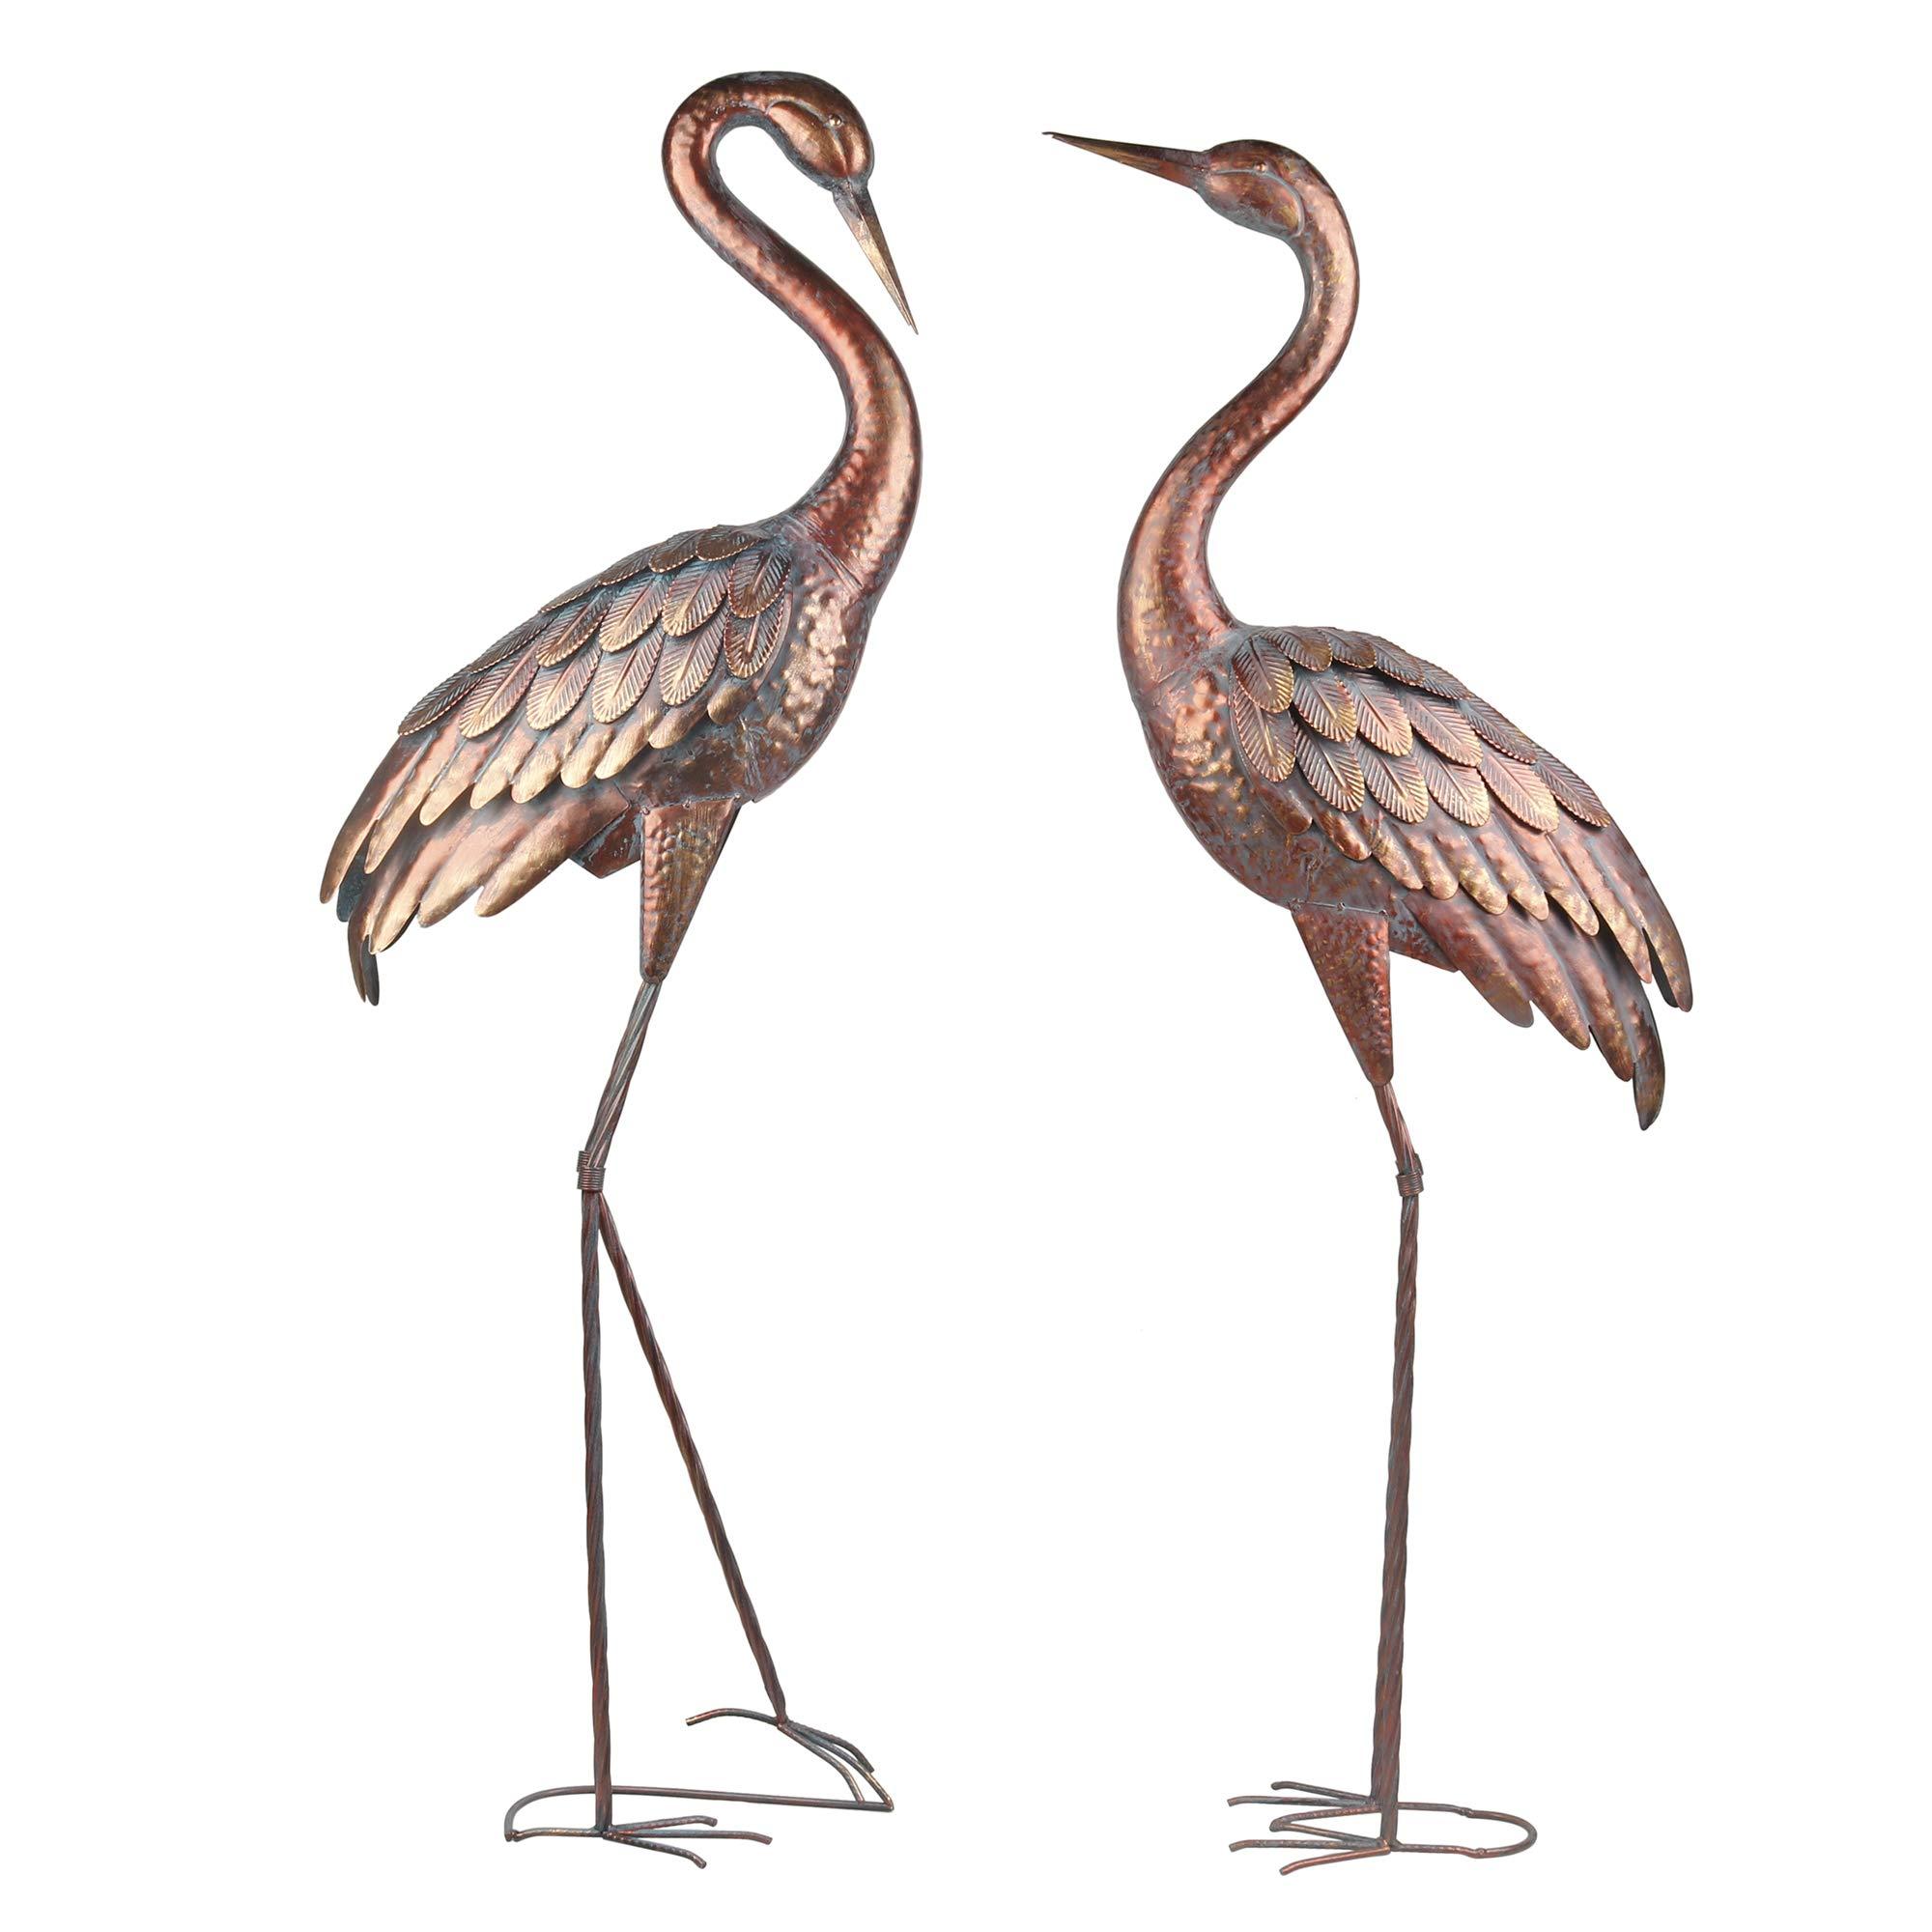 Kircust Garden Statues Patina Heron Decoy, Standing Metal Crane Sculptures Bird Yard Art for Outdoor Decor, Set of 2